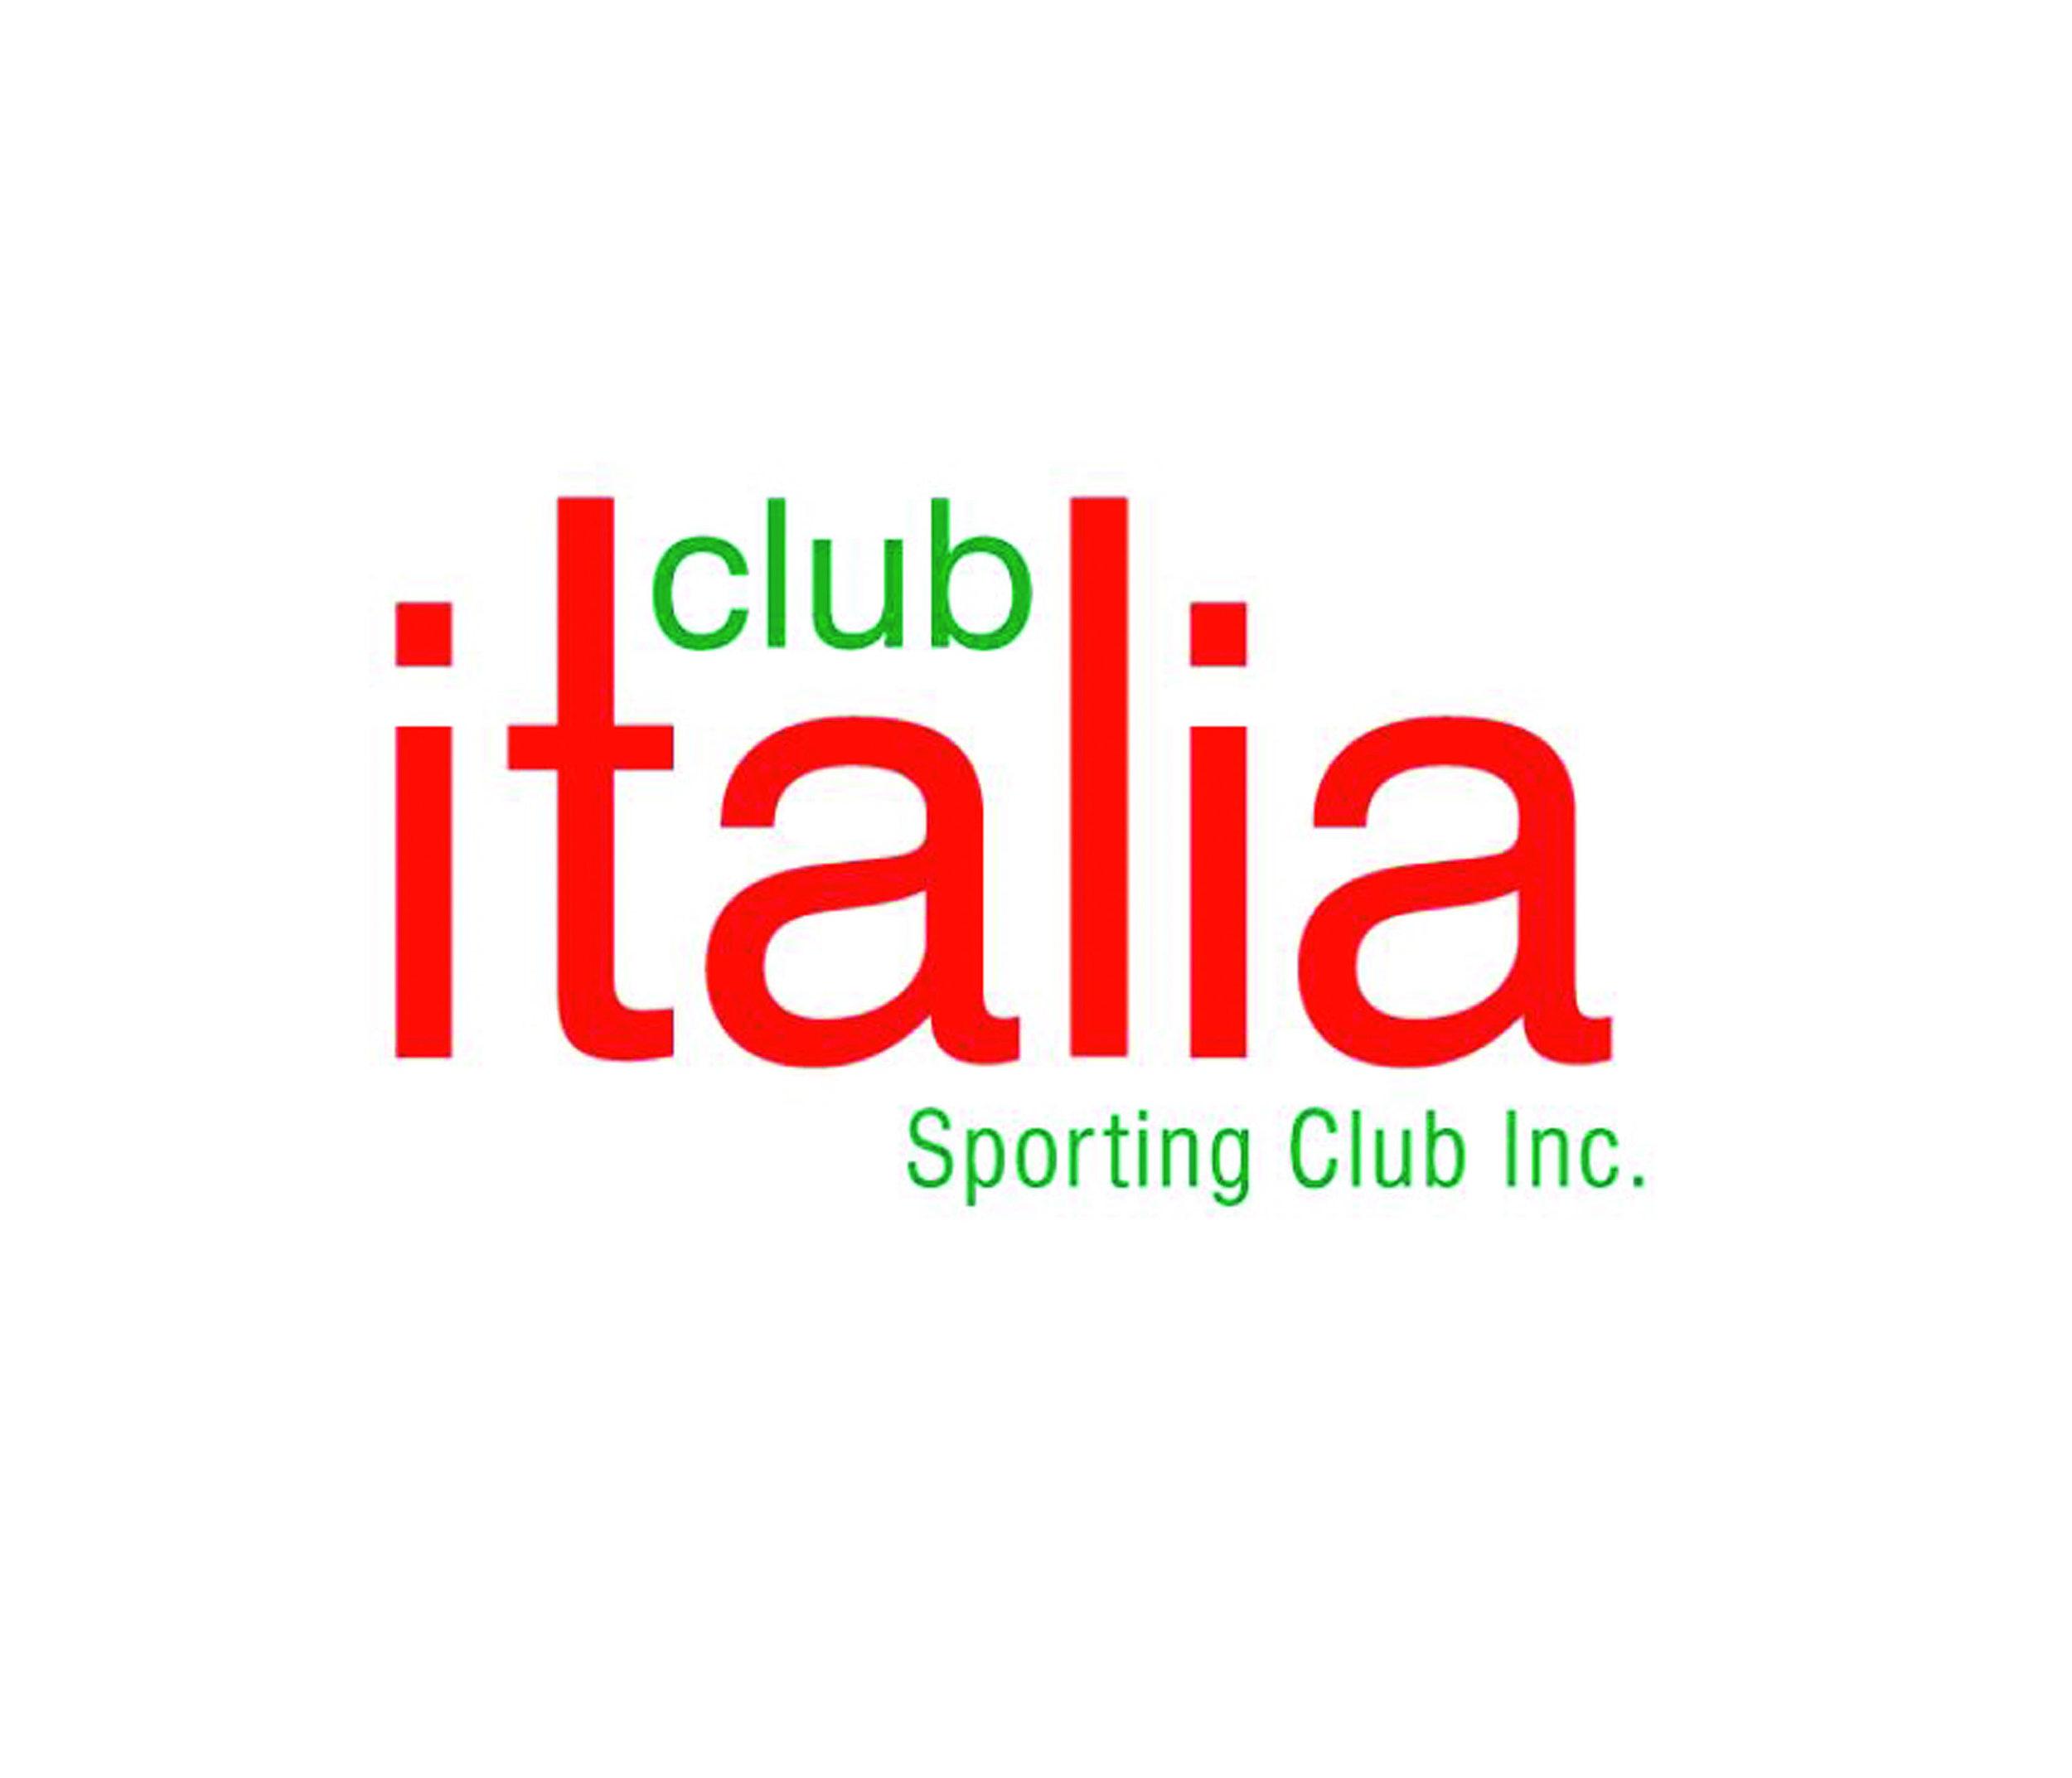 Club Italia.jpg